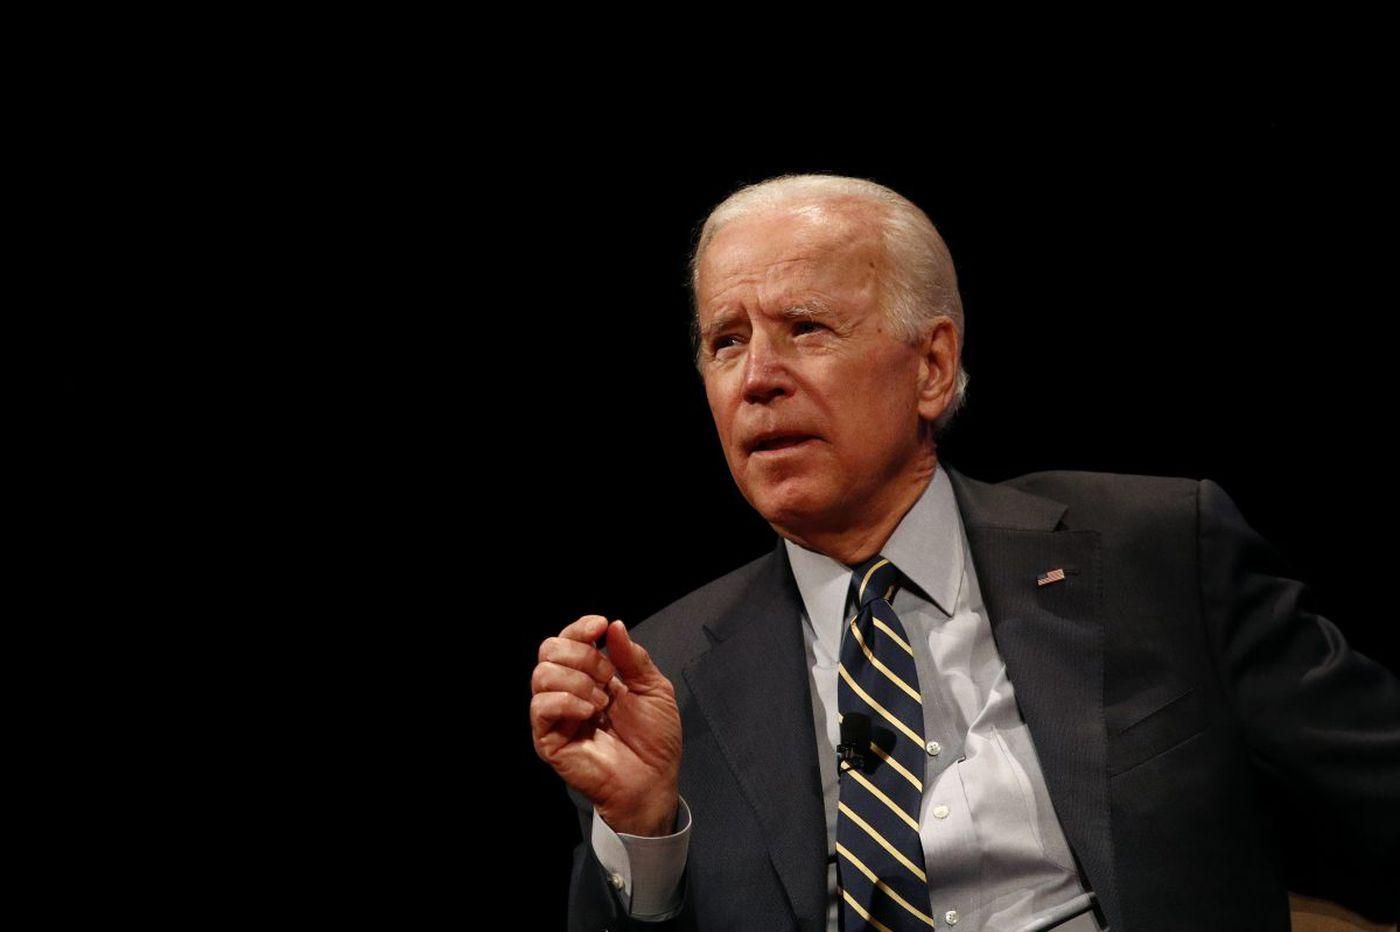 Joe Biden to speak in Philly Wednesday on future of cancer treatment